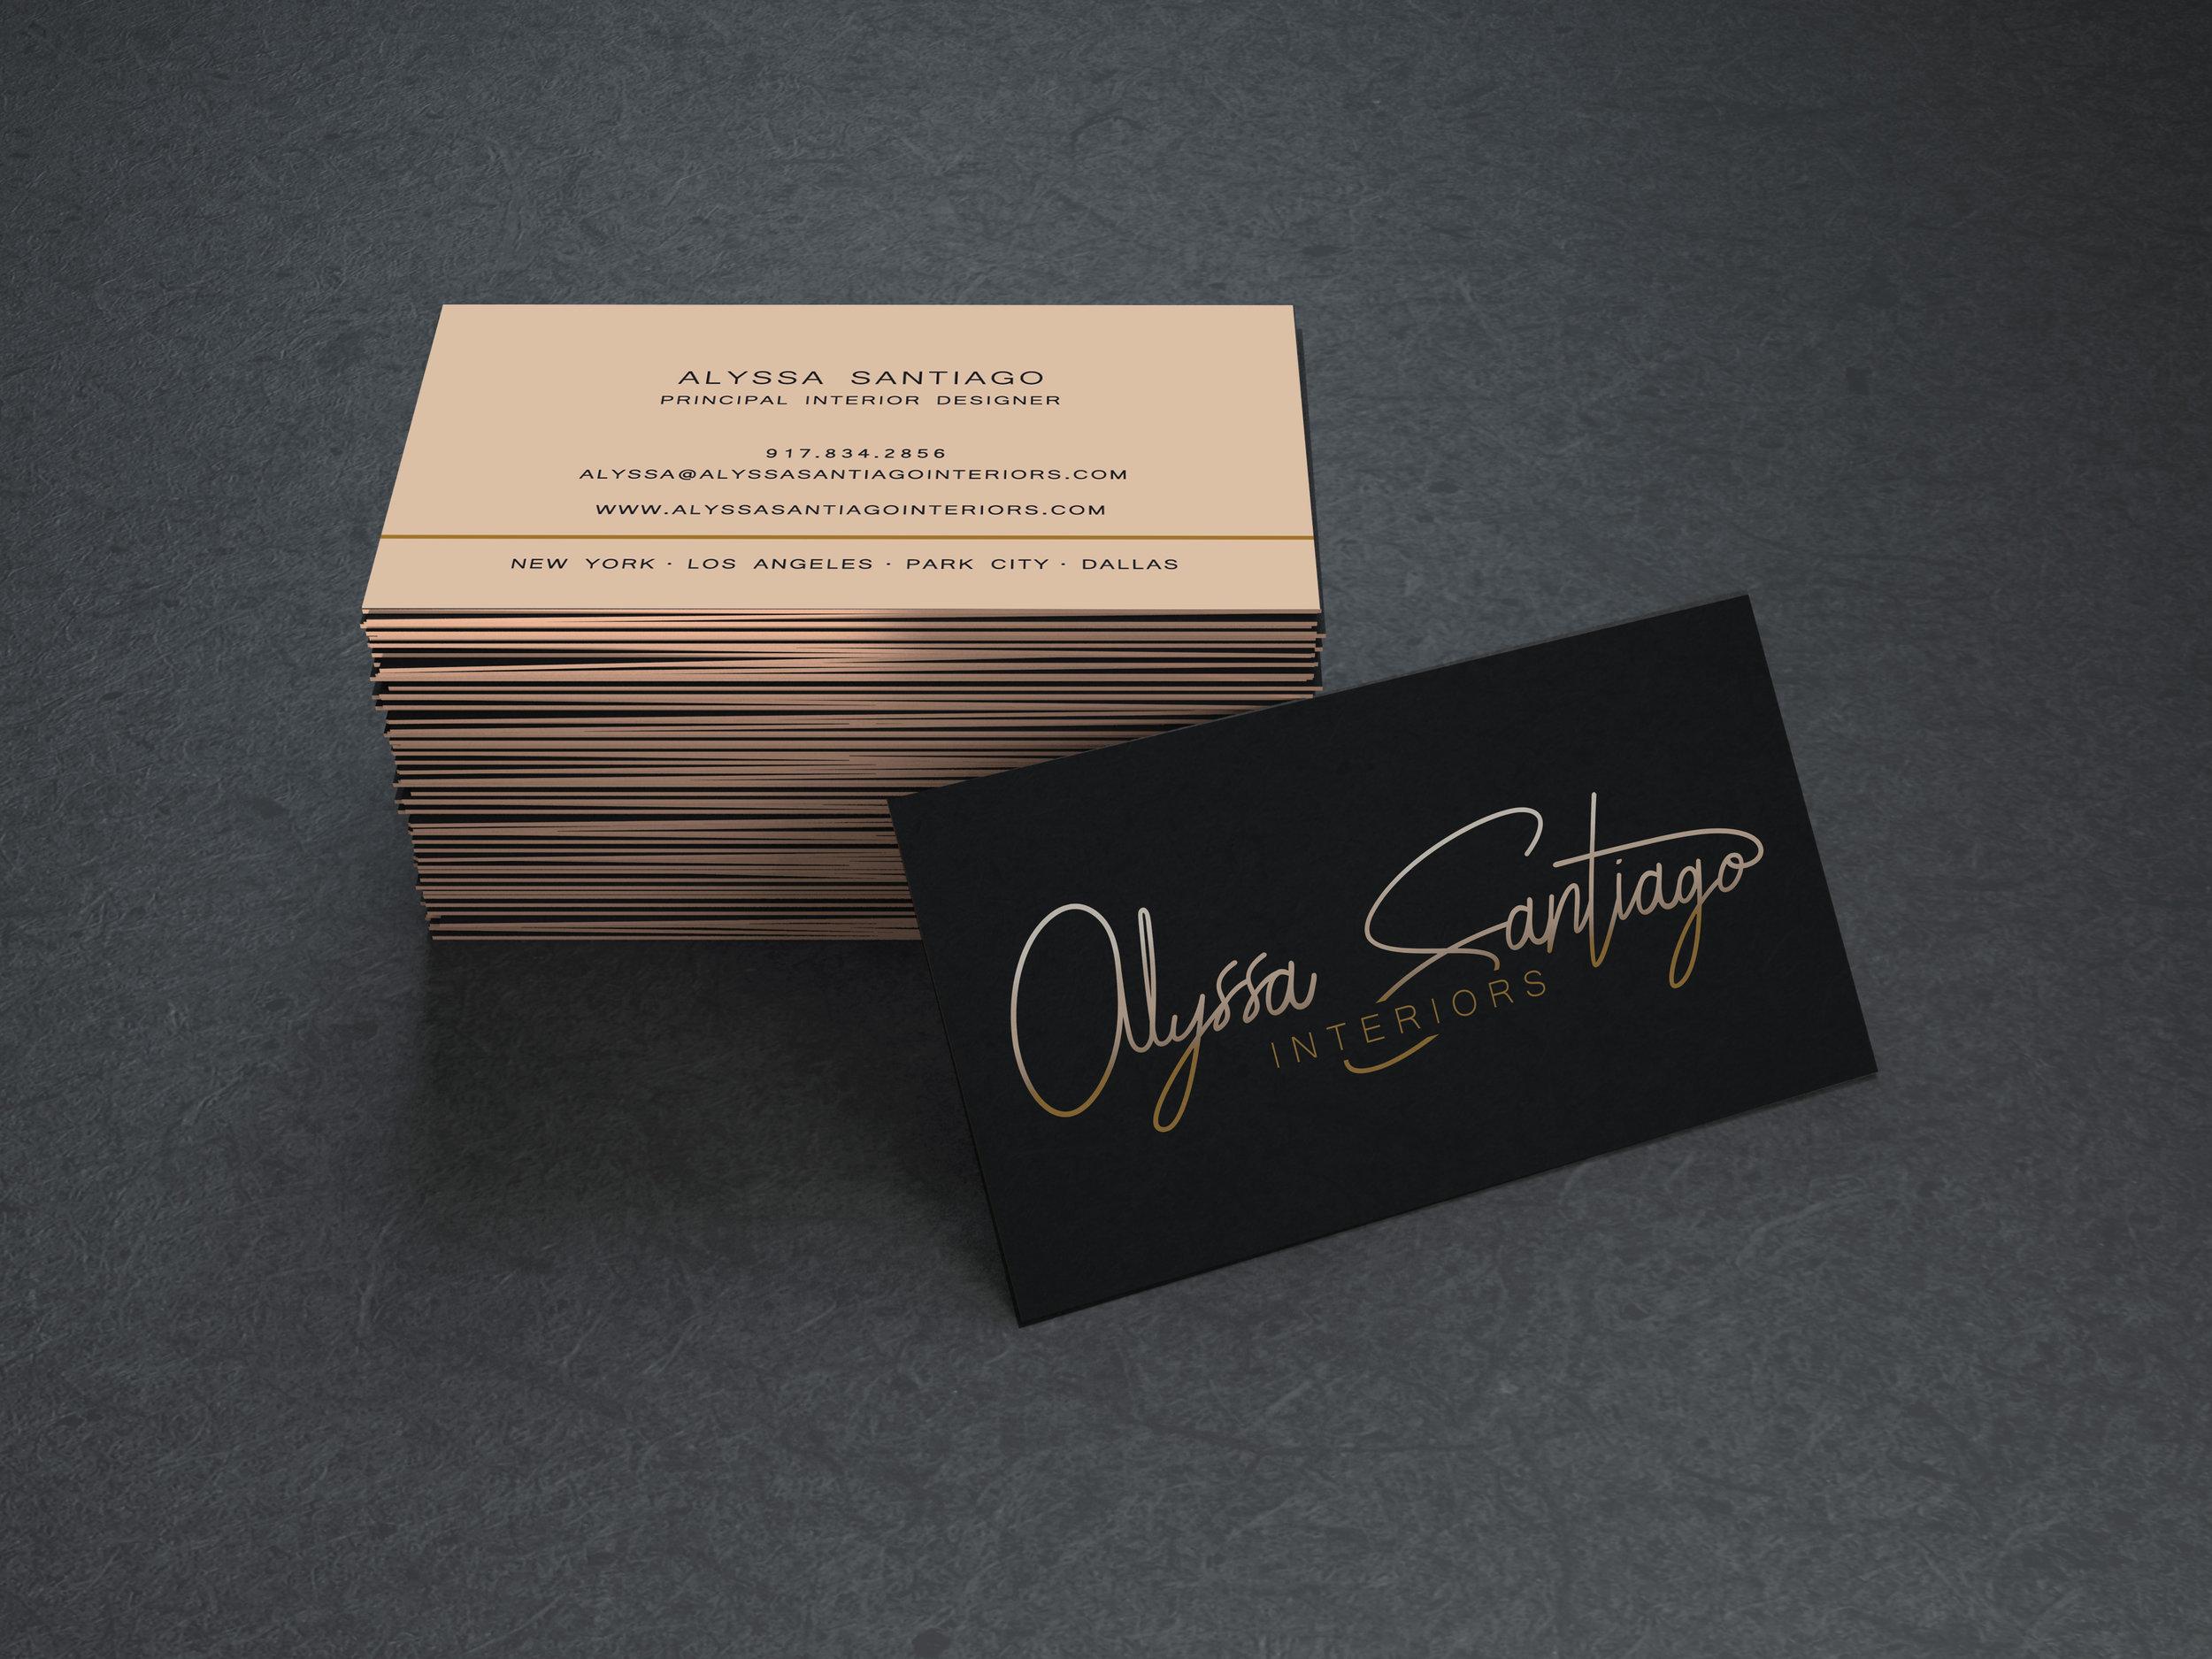 Alyssa+Santiago+Business+Card.jpg